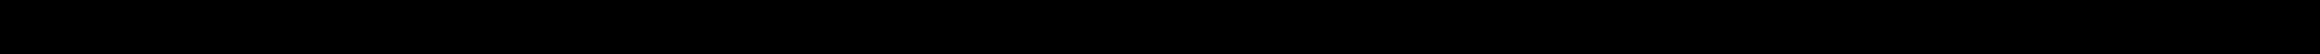 BREMBO 1J0615601, 1J0615601C, 1J0615601N, 1J0615601P, 1J0615601Q Brzdový kotouč